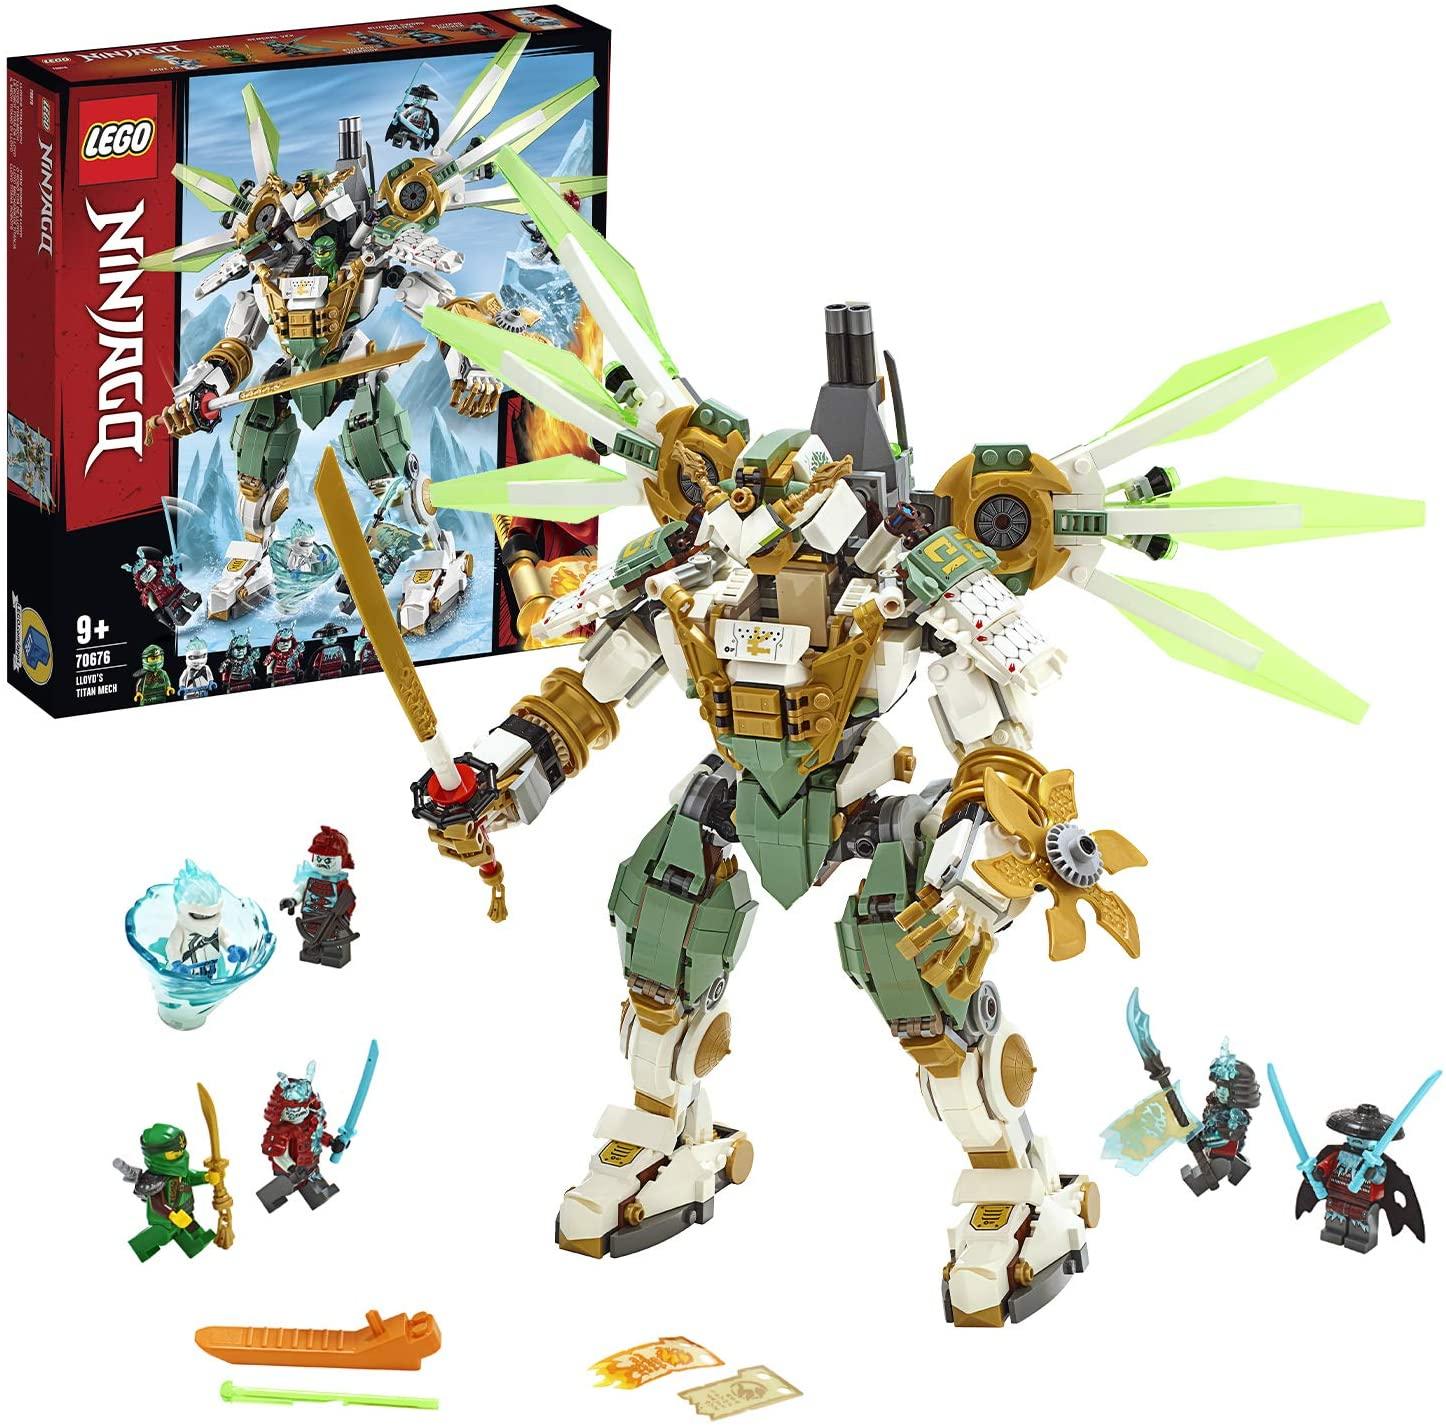 Lego Ninjago 70676 Lloyds Titan Mech £47.61 @ Amazon Germany